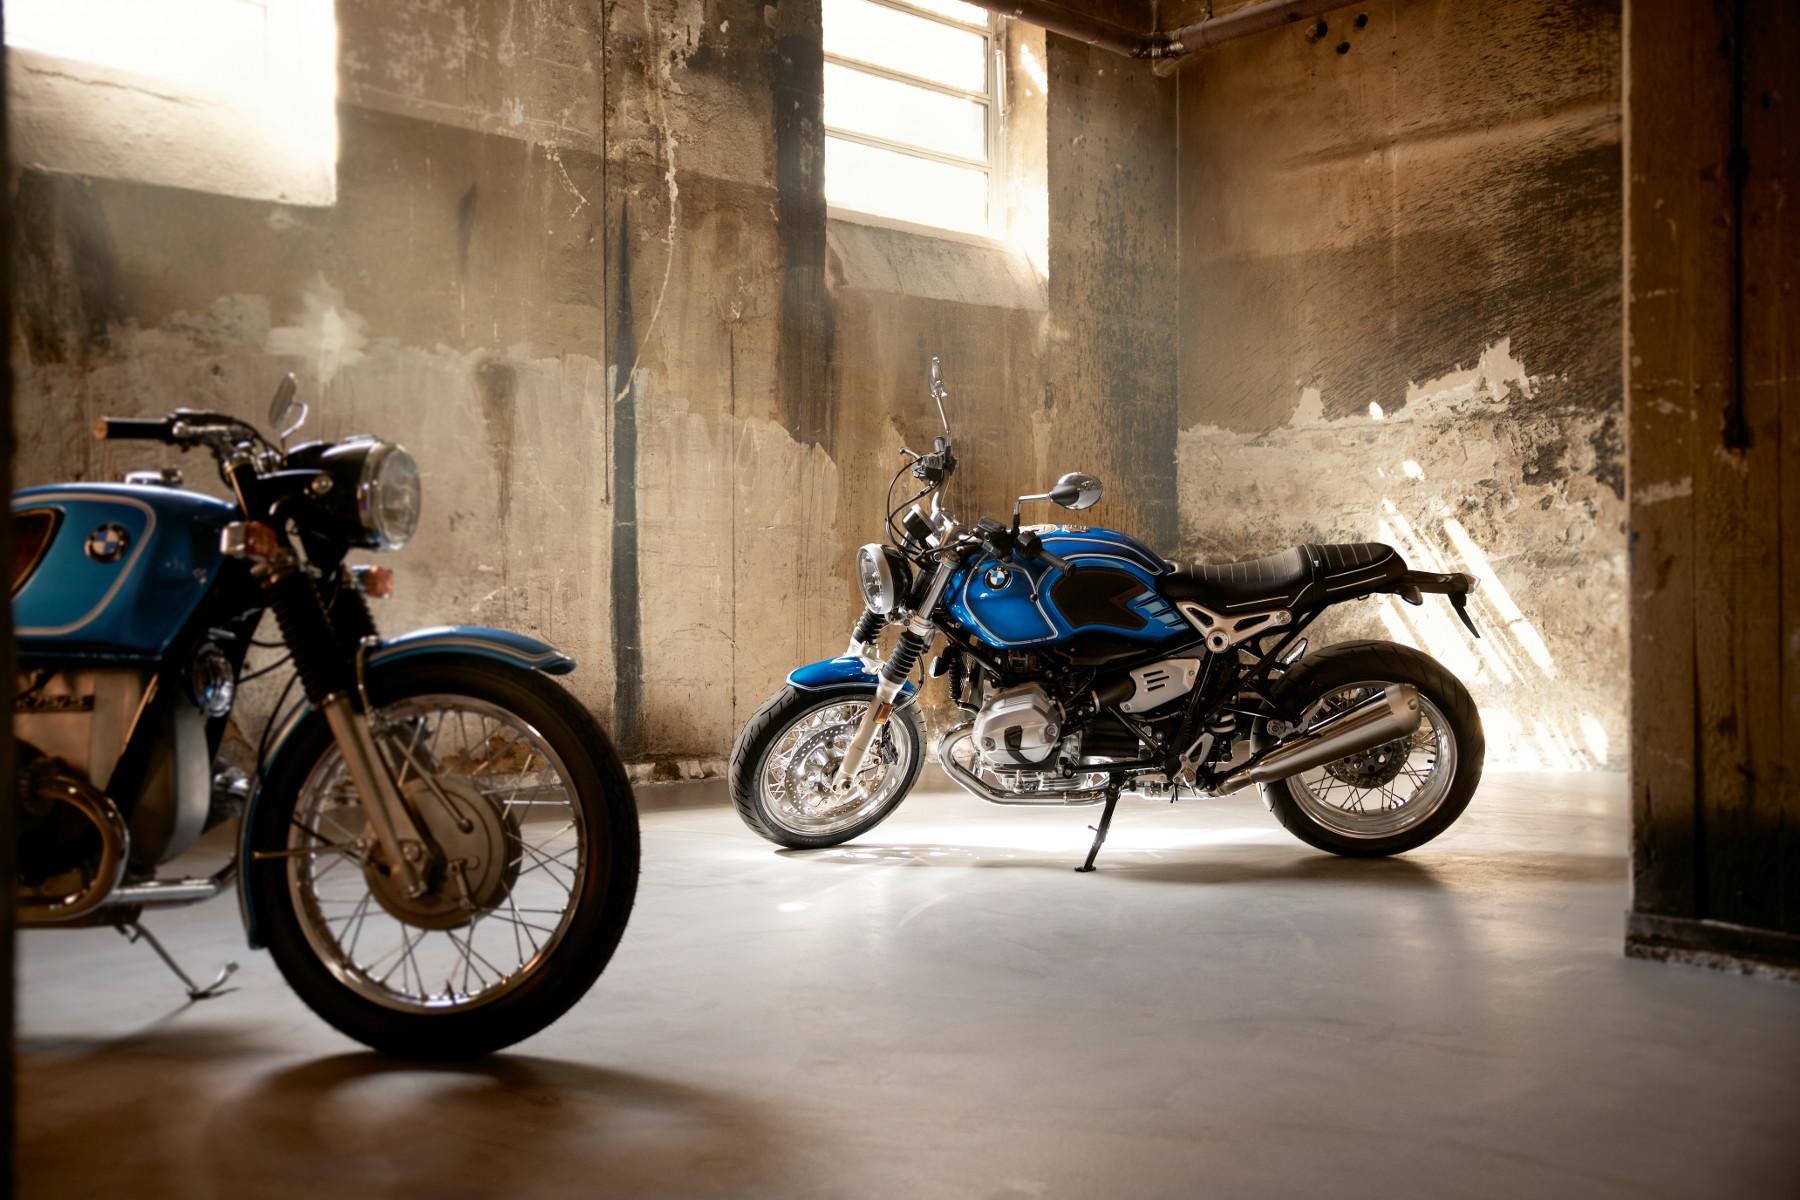 BMW R nineT / 5, celebrando medio siglo de historia